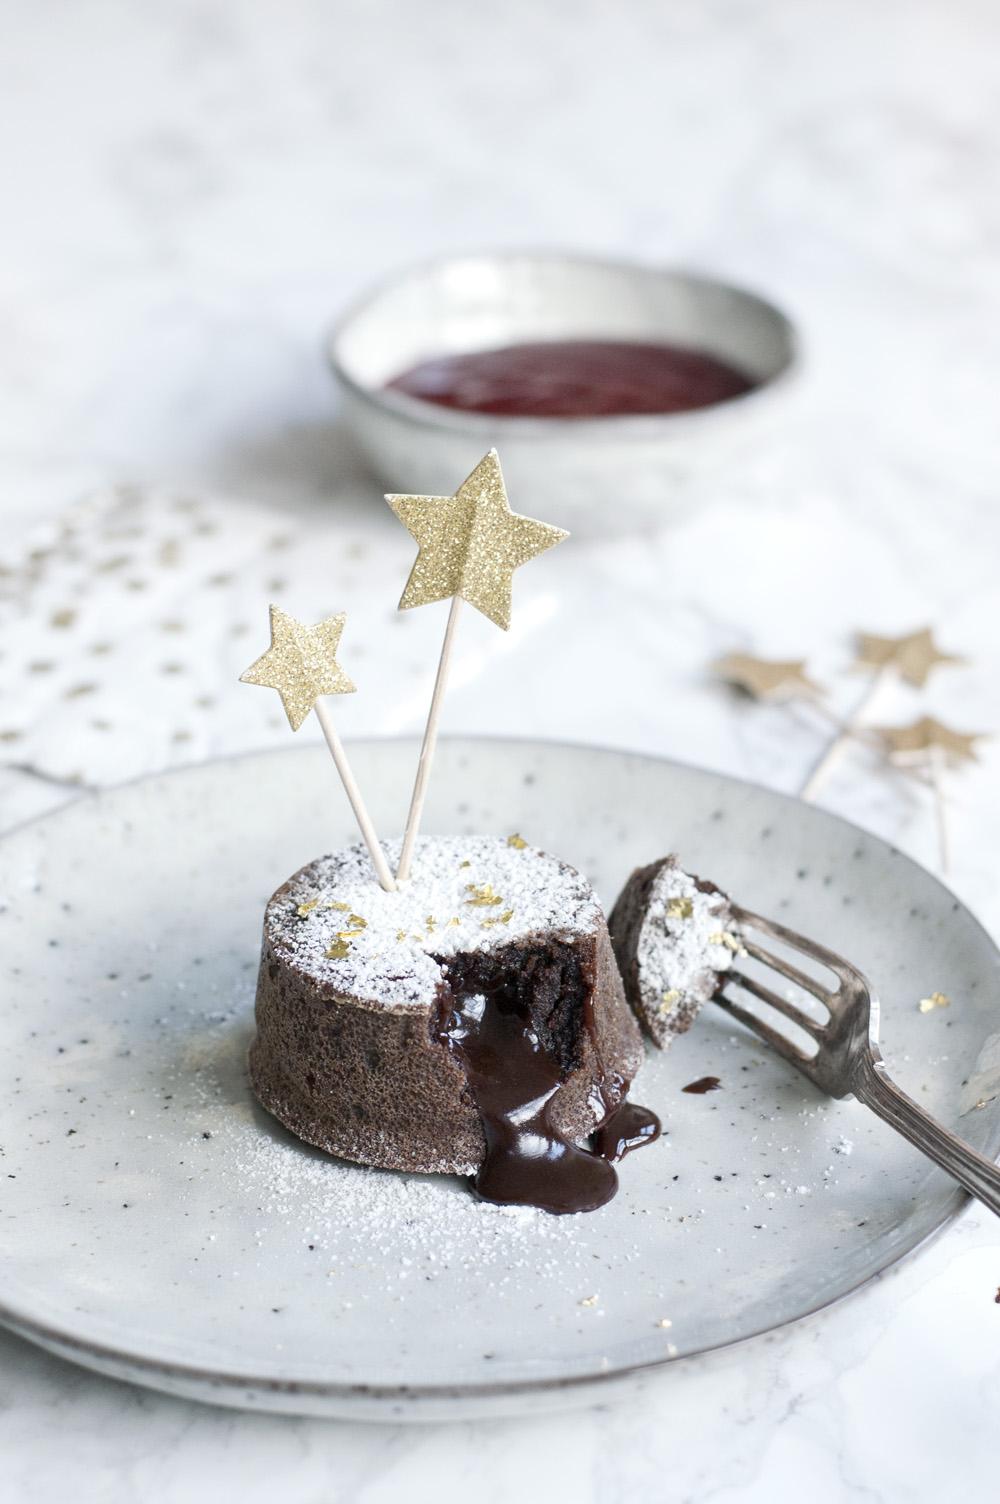 Copenhagen Cakes Copenhagencakes Chokoladefondant Chocolate Fondant New Years Dessert Nytaarsaften 4